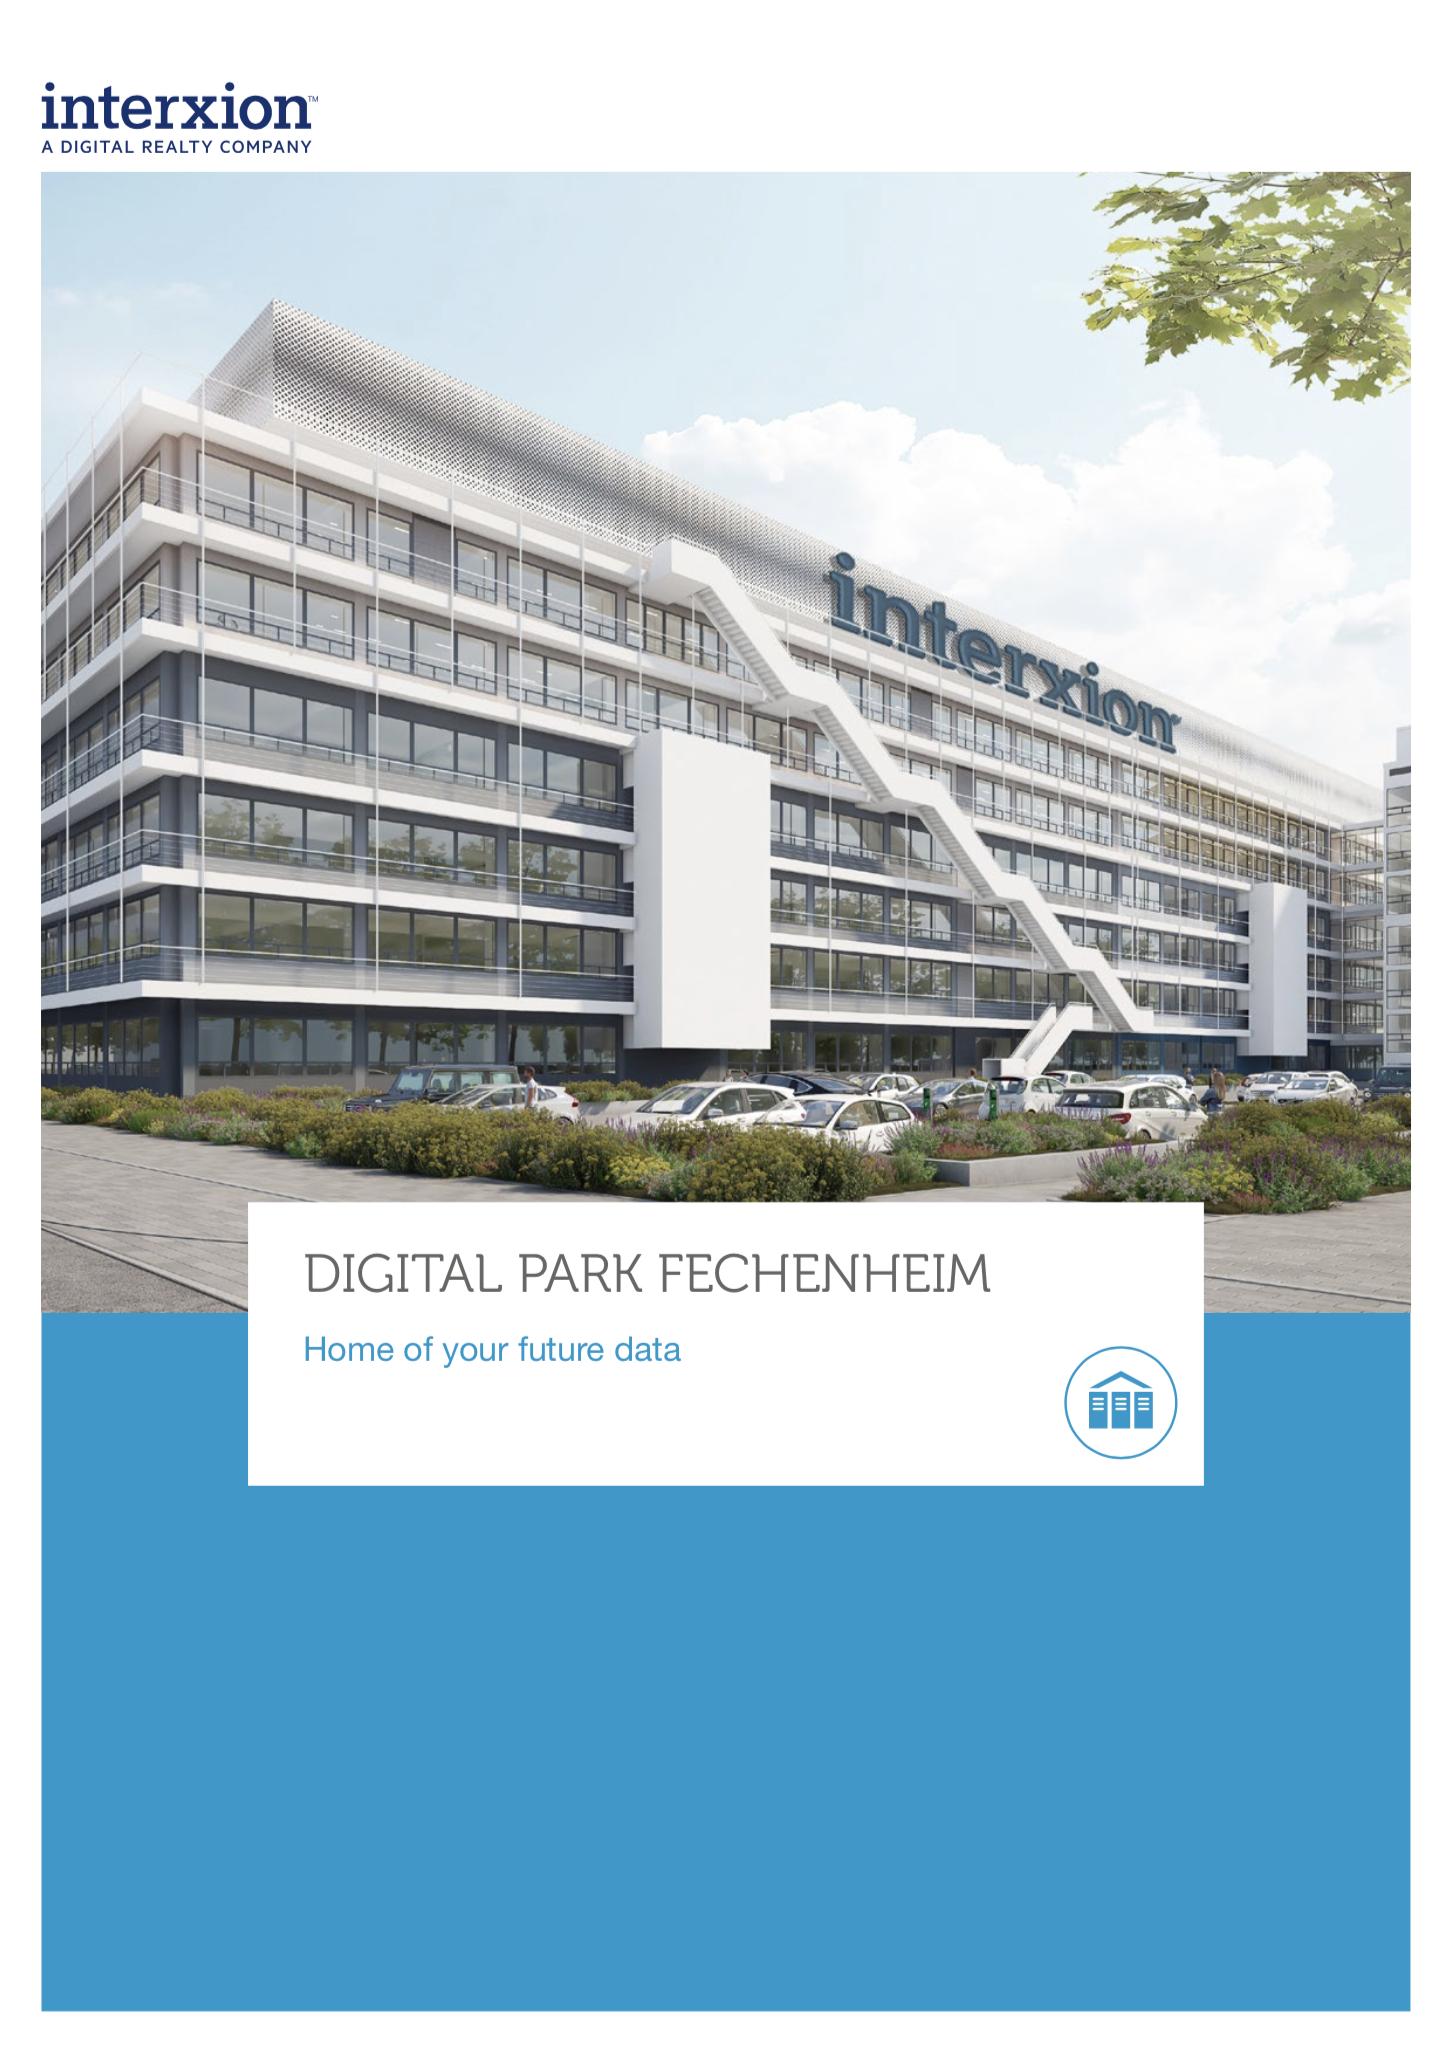 Digital Park Fechenheim - Home of your future data